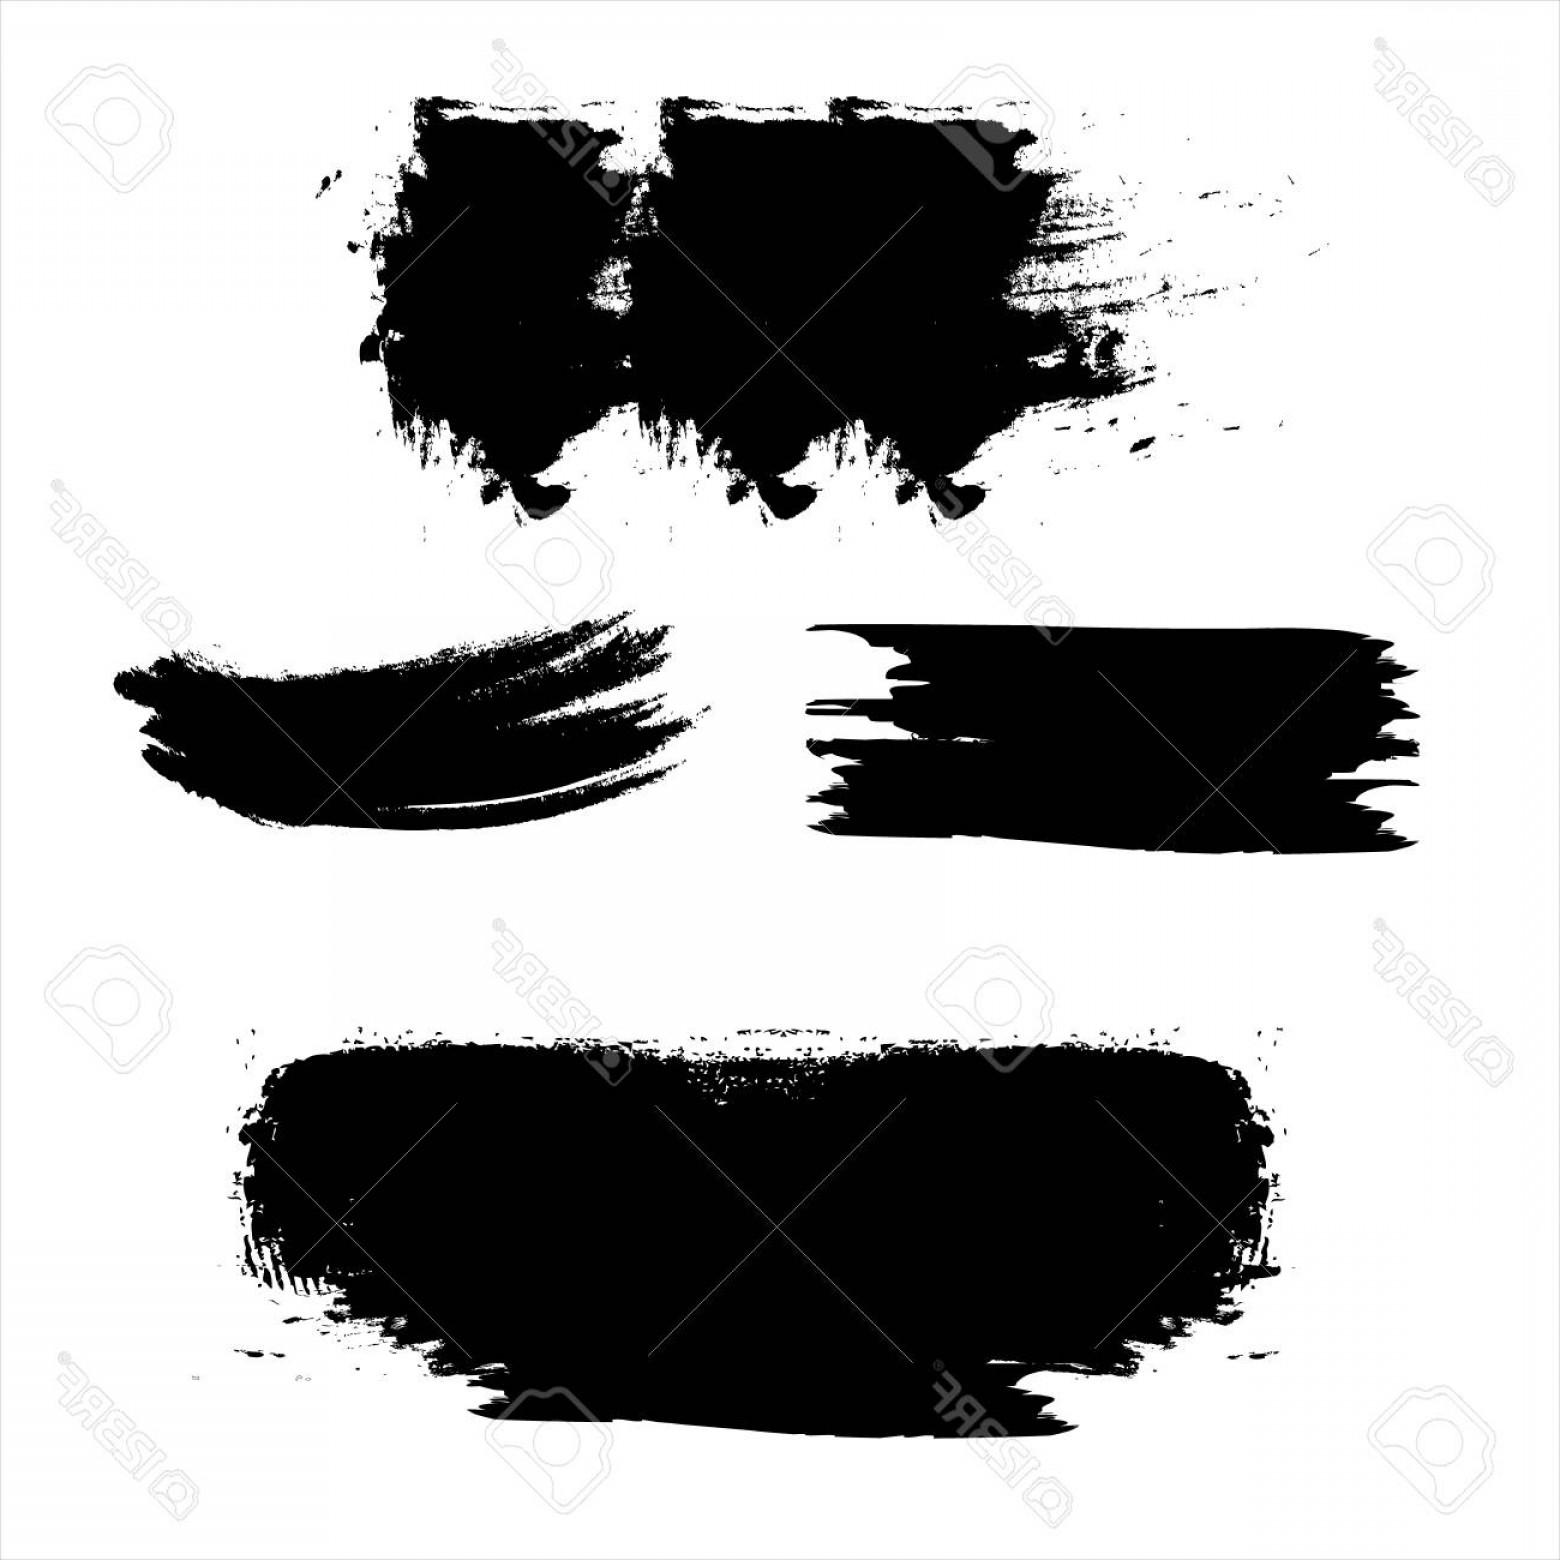 1560x1560 Photostock Vector Black Paint Brush Strokes Dirty Inked Grunge